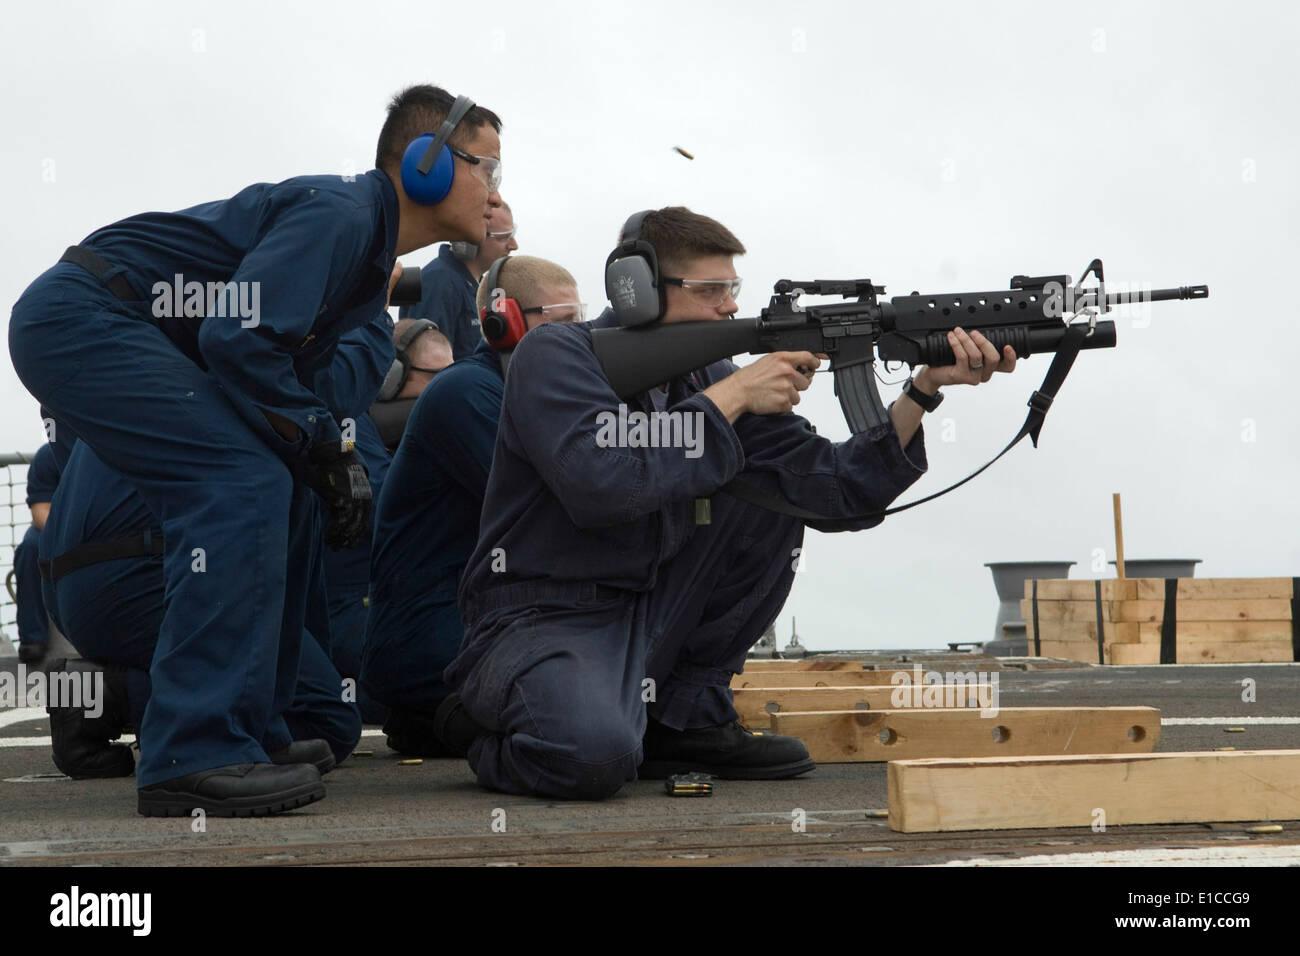 Marina de los EE.UU. 2ª clase Controlman fuego Chaung Pha observa como técnico de casco de segunda clase Briscoe Donipaul desencadena un fusil M-16 d Foto de stock